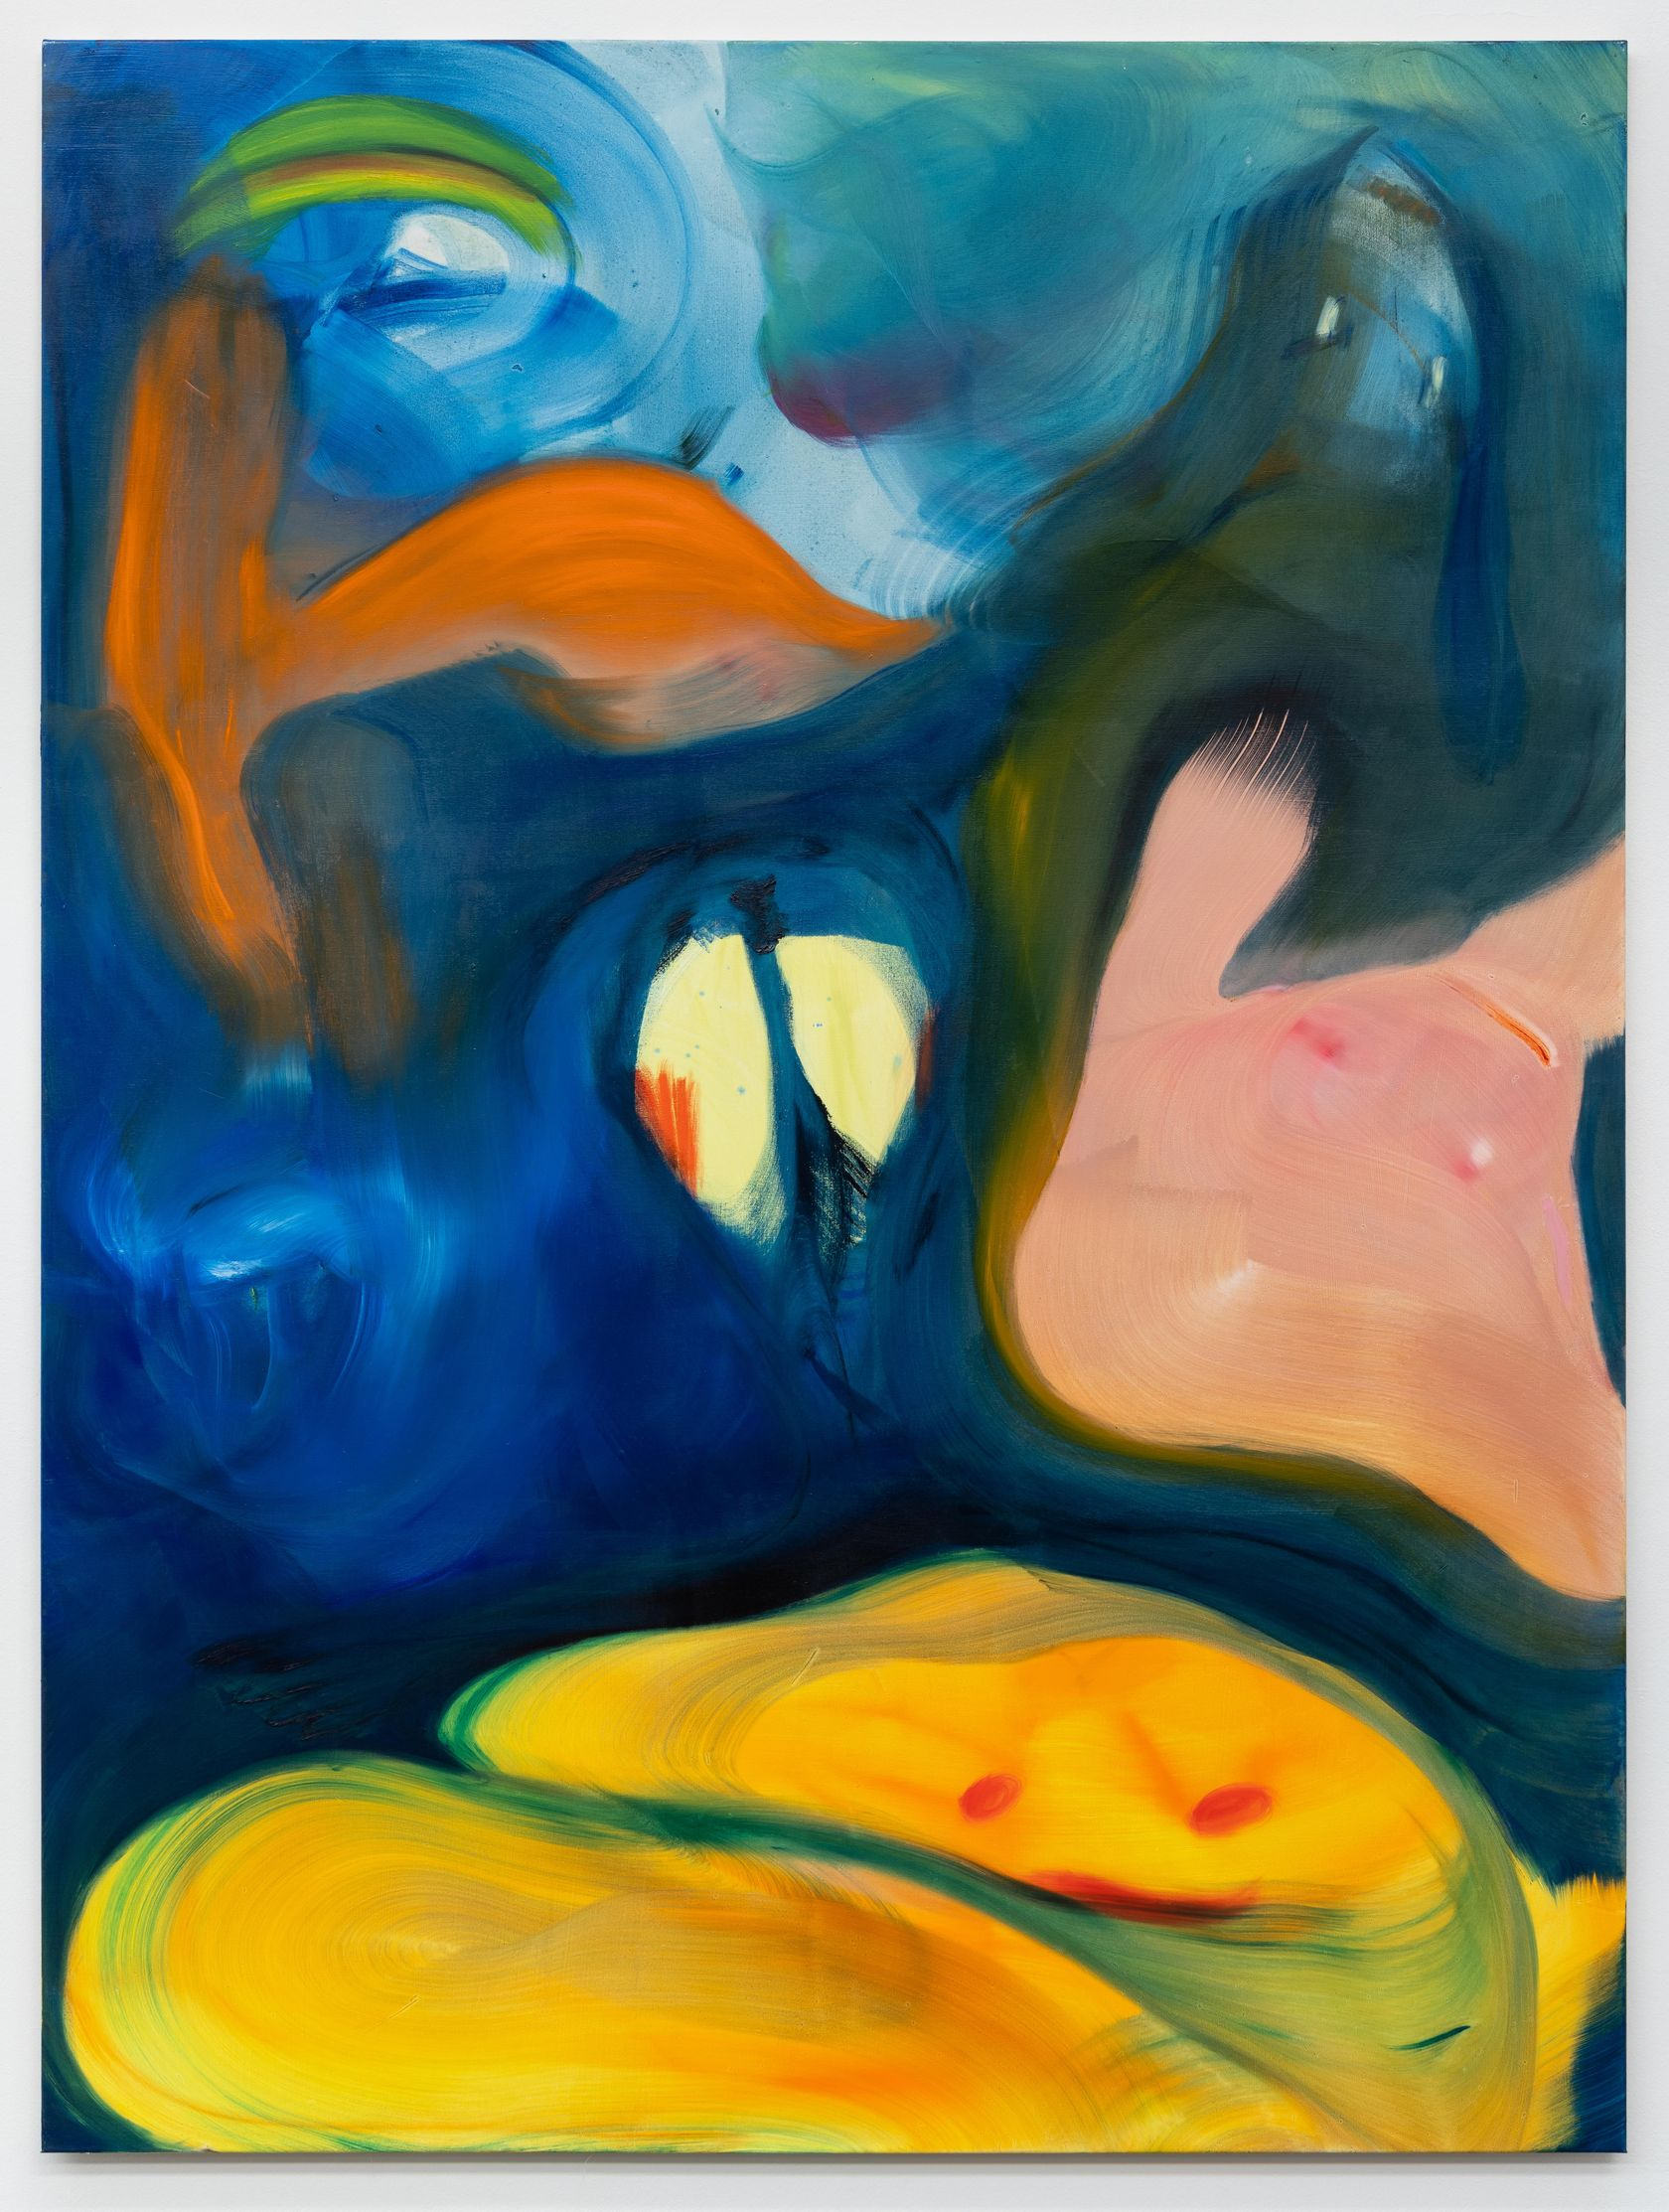 Aneta Kajzer, Under The Surface, 2021 Huile sur toile220 × 165 cm / 86 5/8 × 65  in.